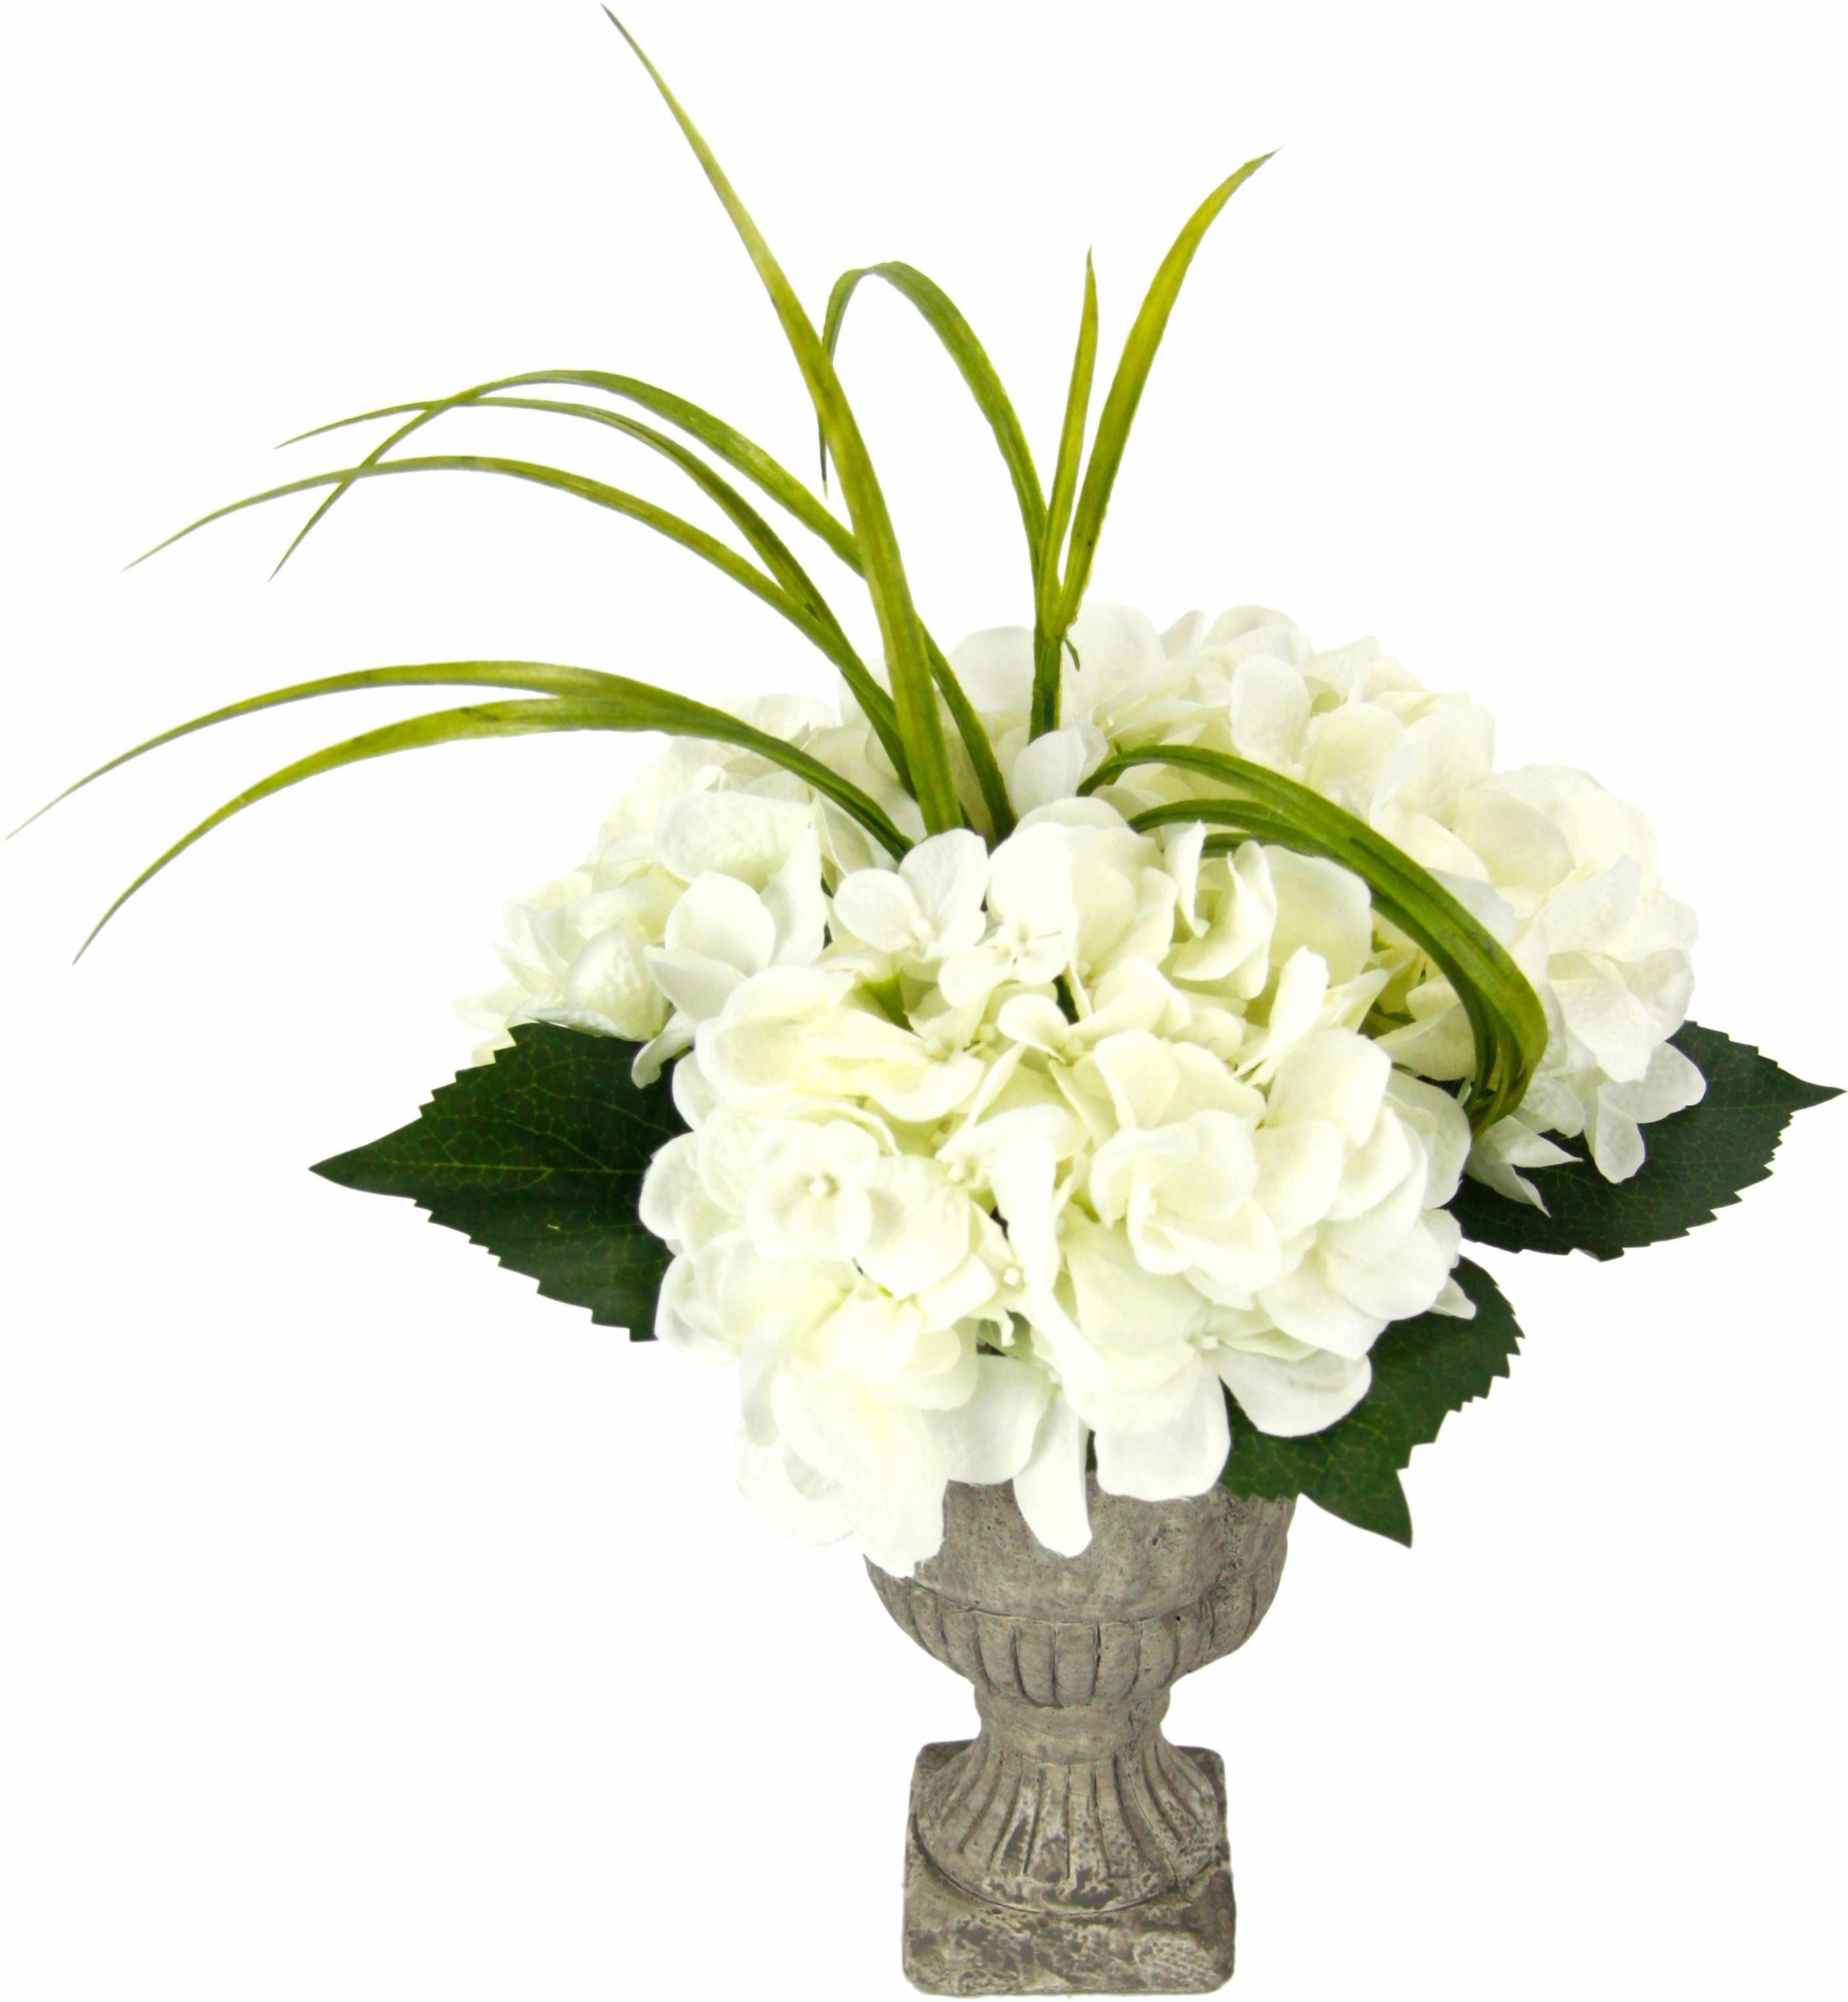 Kunstpflanze Hortensie in Pokal 30cm